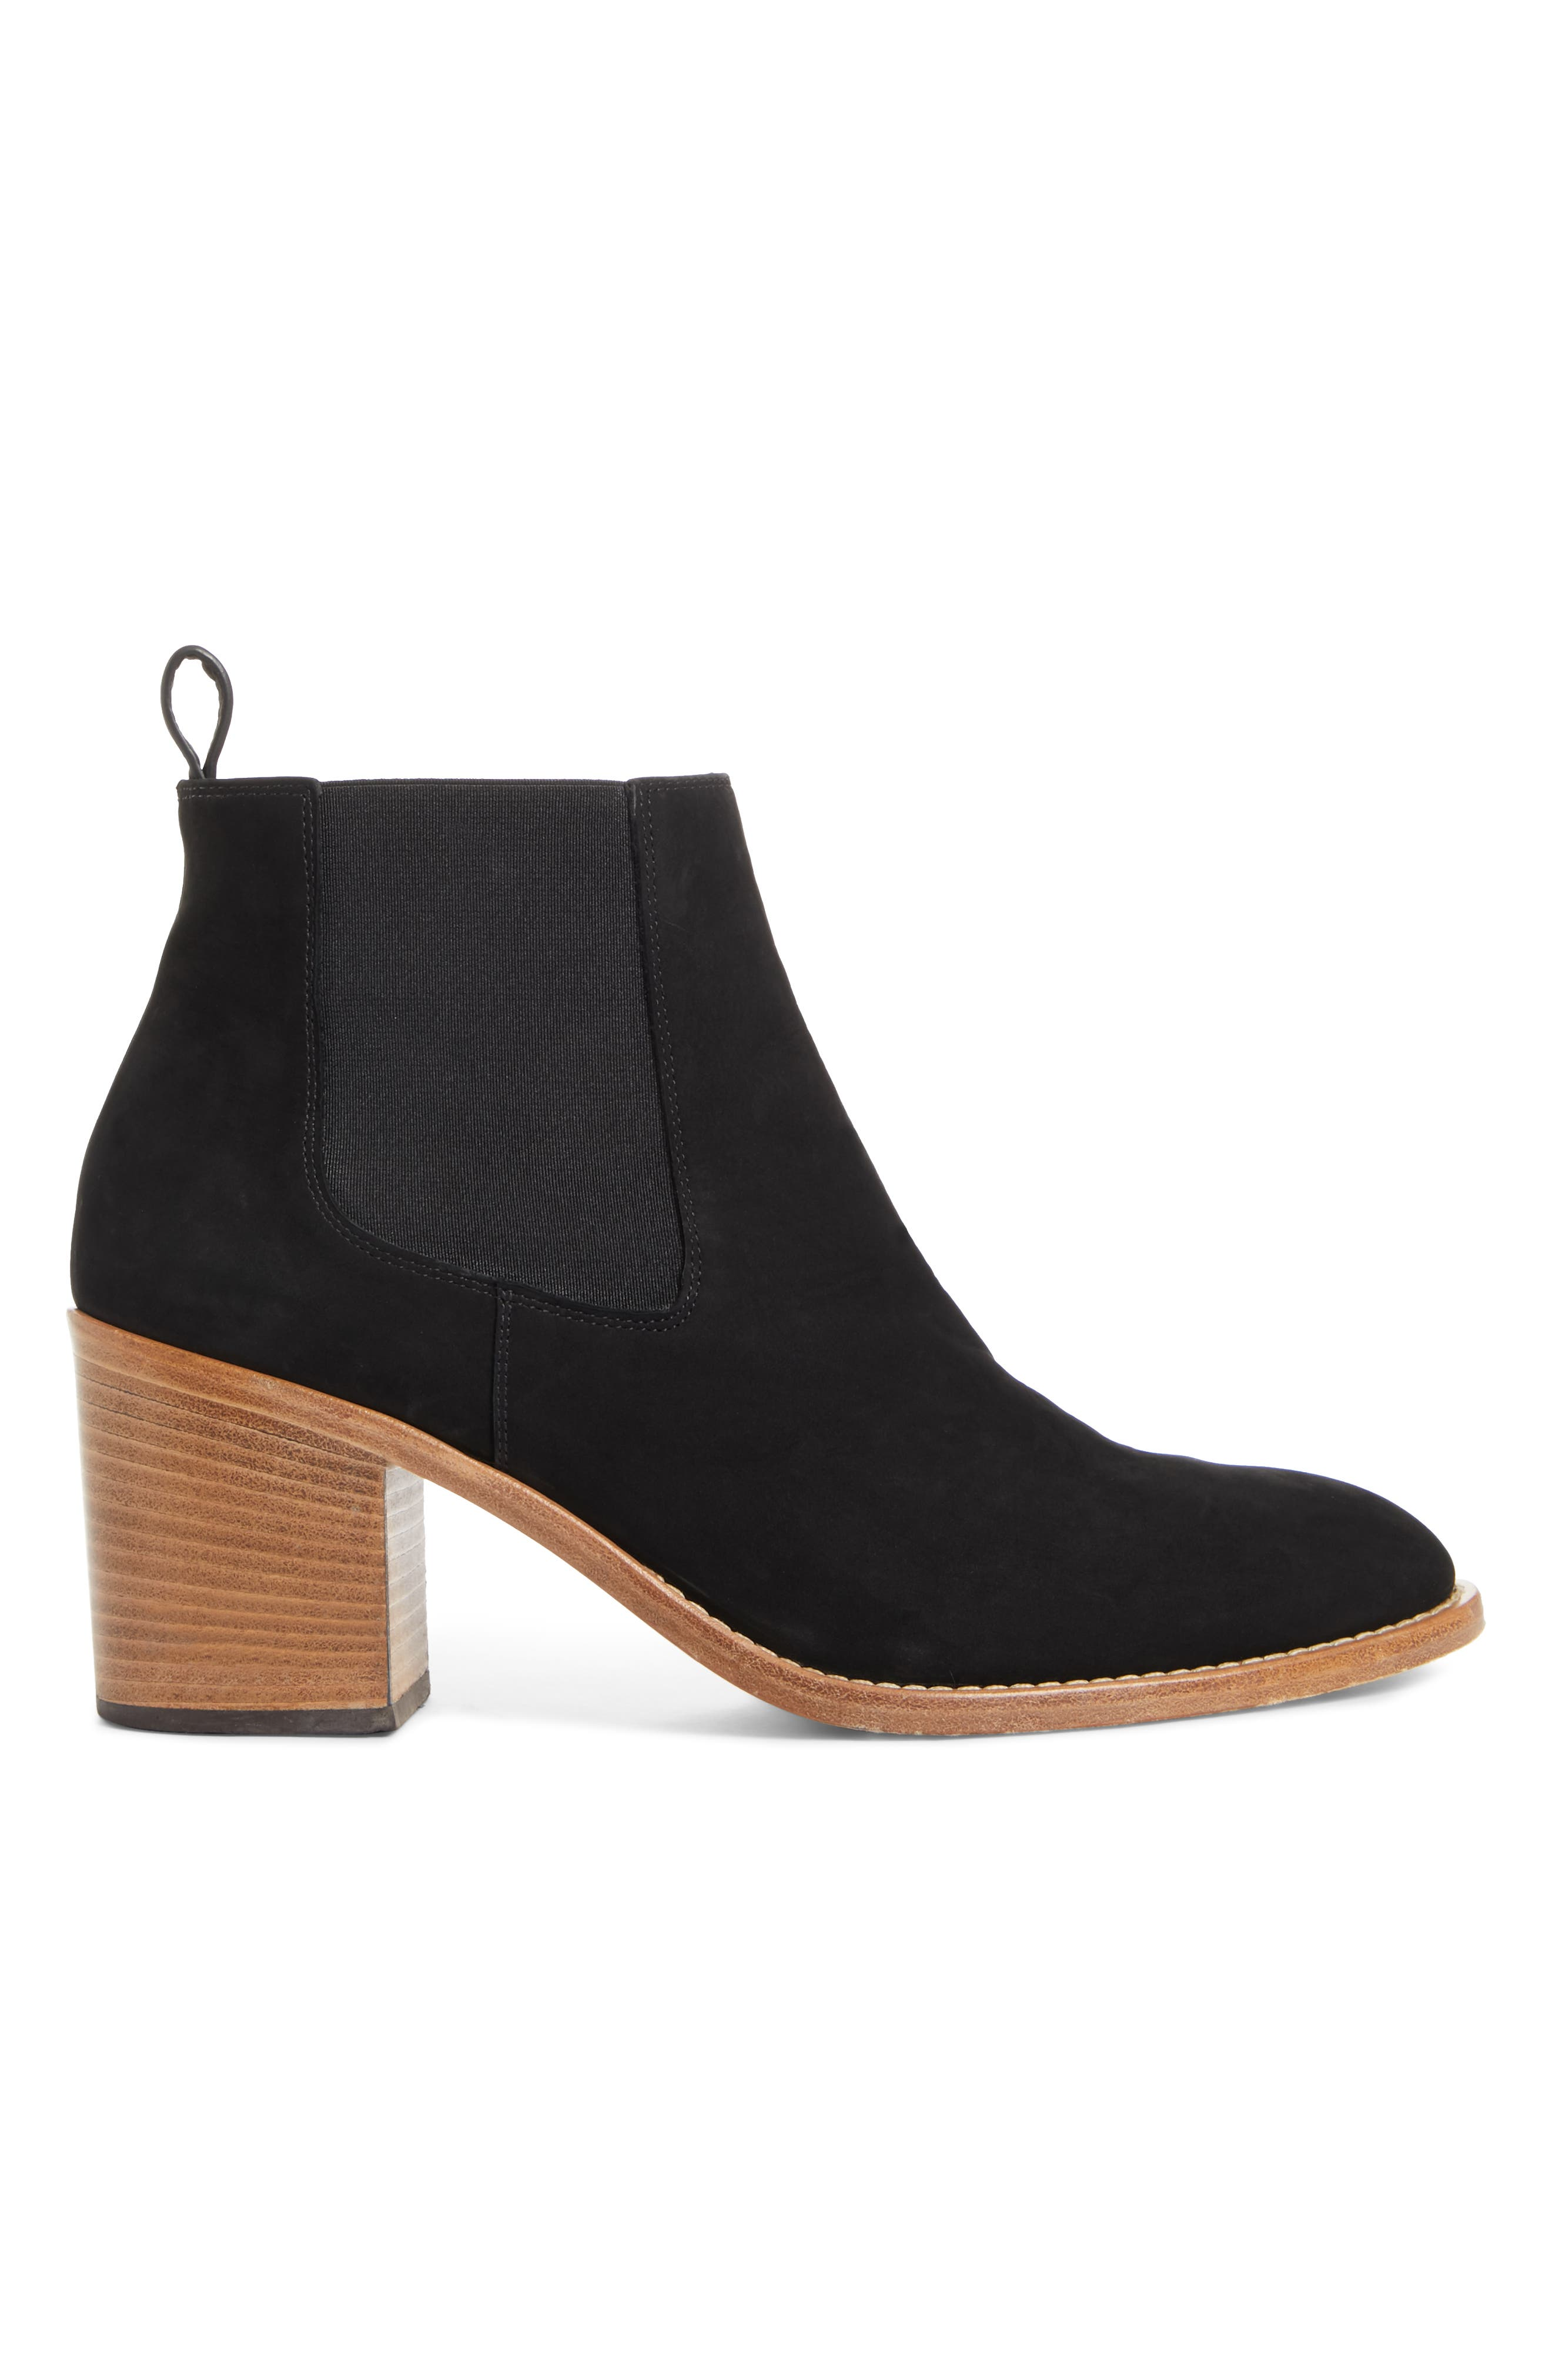 518539a6935 Women's Shoes Sale | Nordstrom